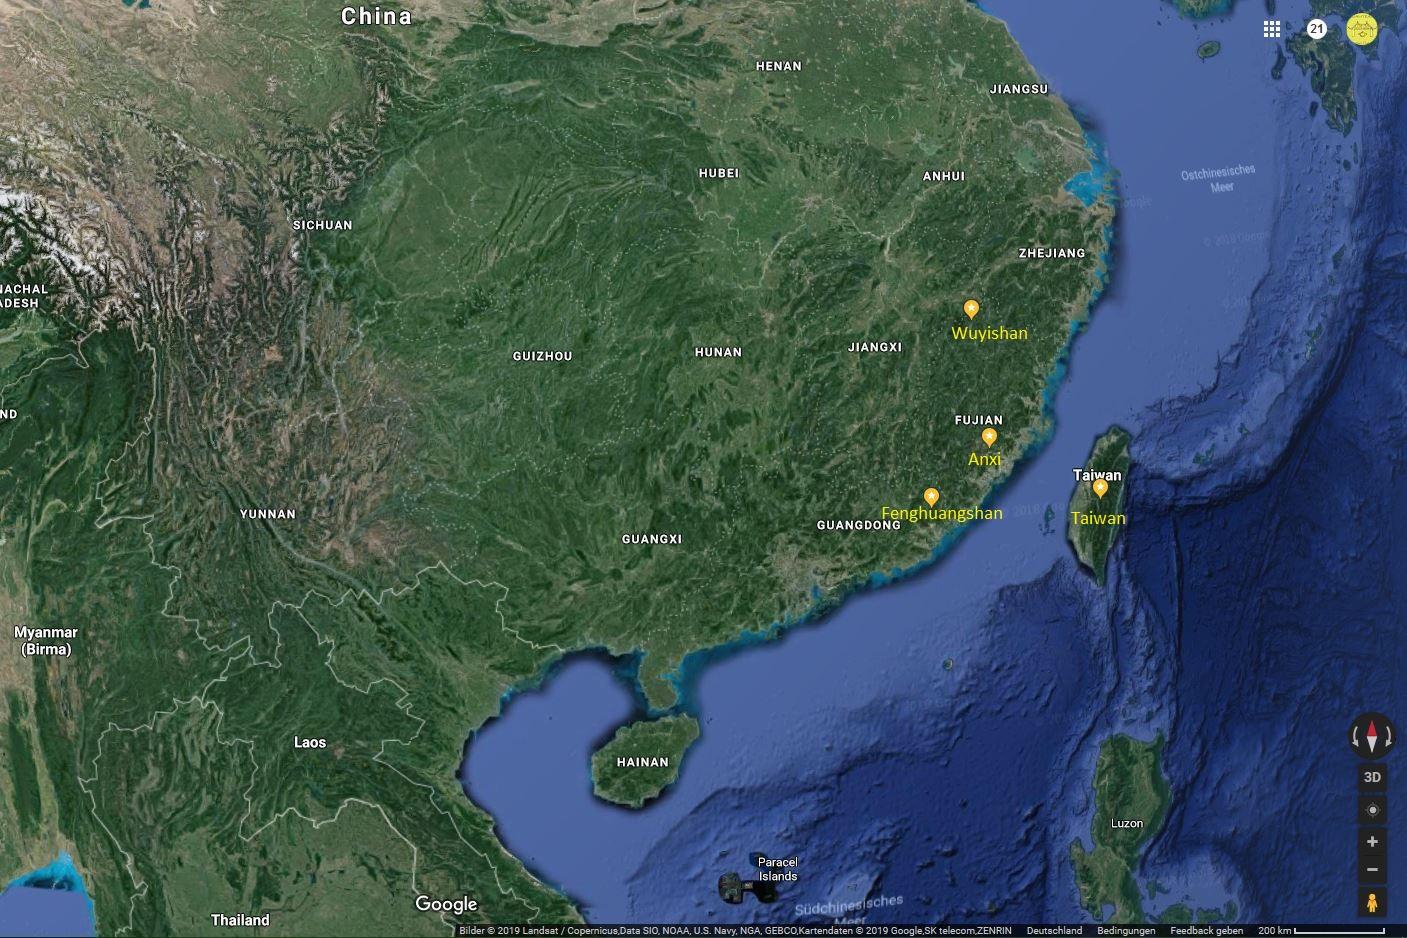 4 Herkunftsregionen für Oolong-Tees : Wuyishan, Anxi, Guangdong, Taiwan